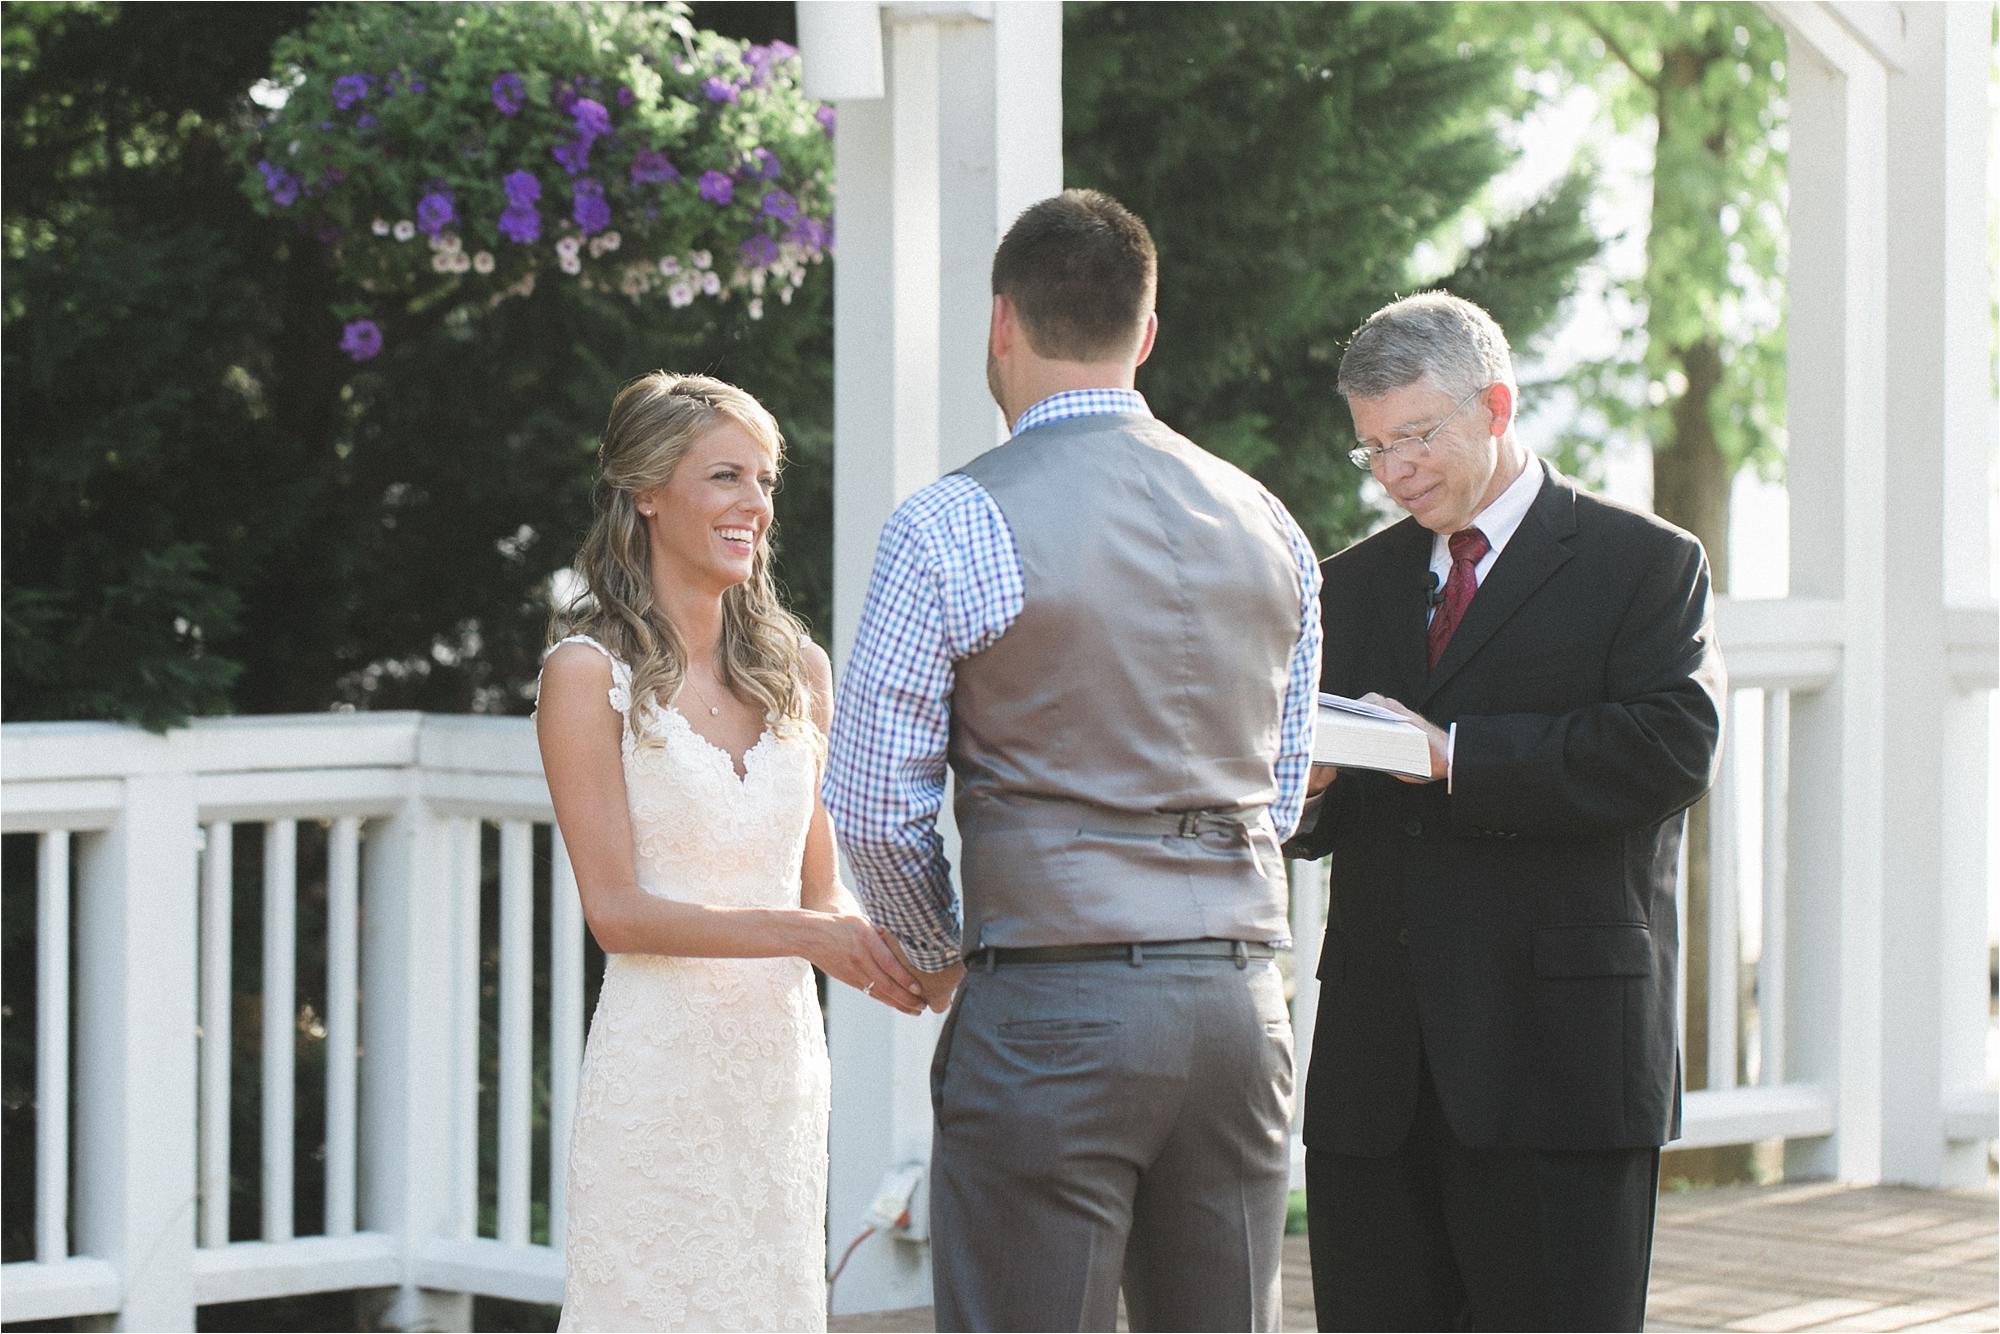 stephanie-yonce-boathouse-sunday-park-virginia-wedding-photo-018.JPG